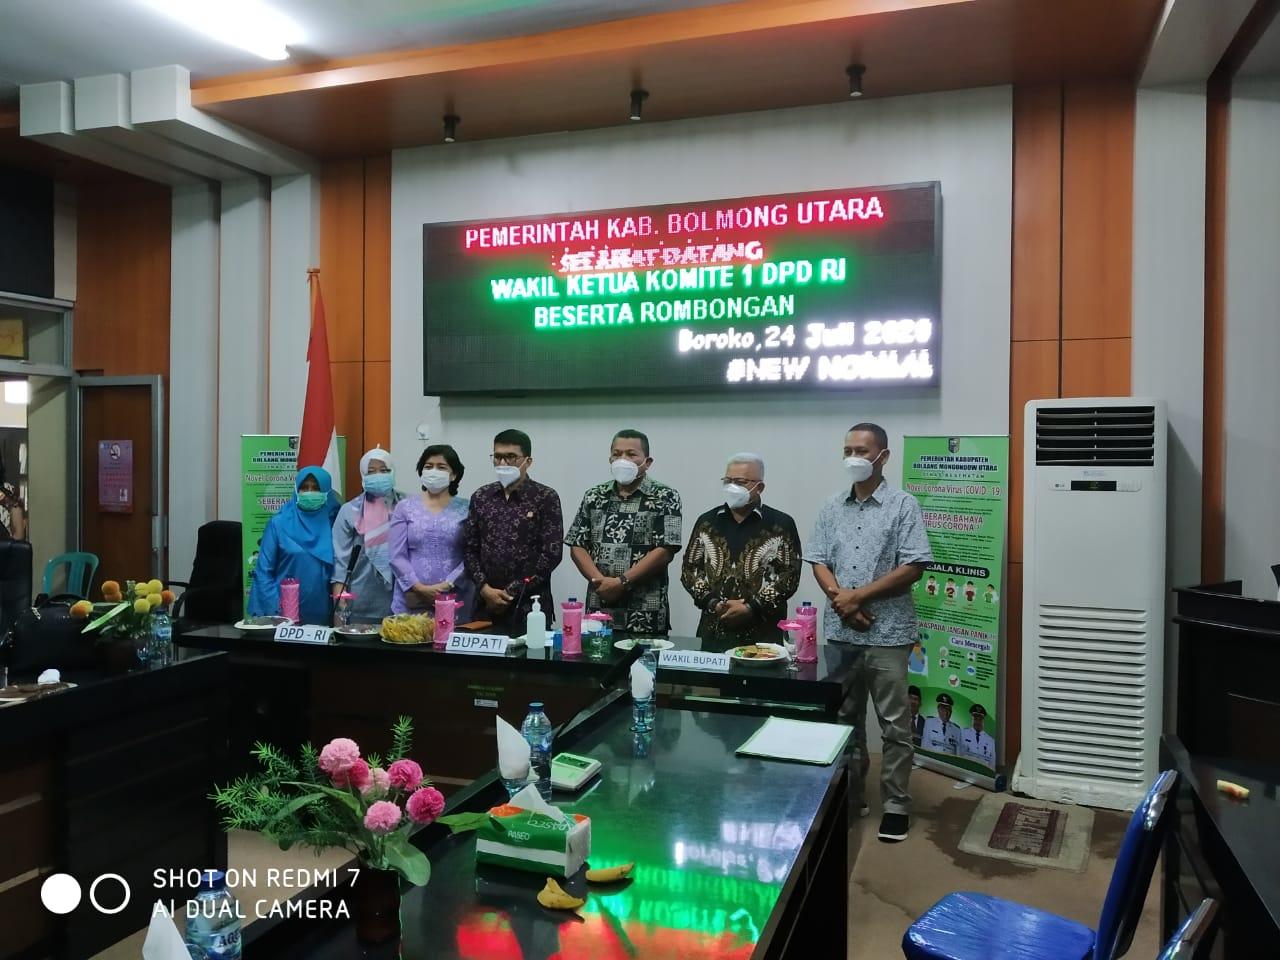 Wakil Ketua Komite I DPD RI Djafar Alkatiri Kunjungan Kerja Ke Bolmut